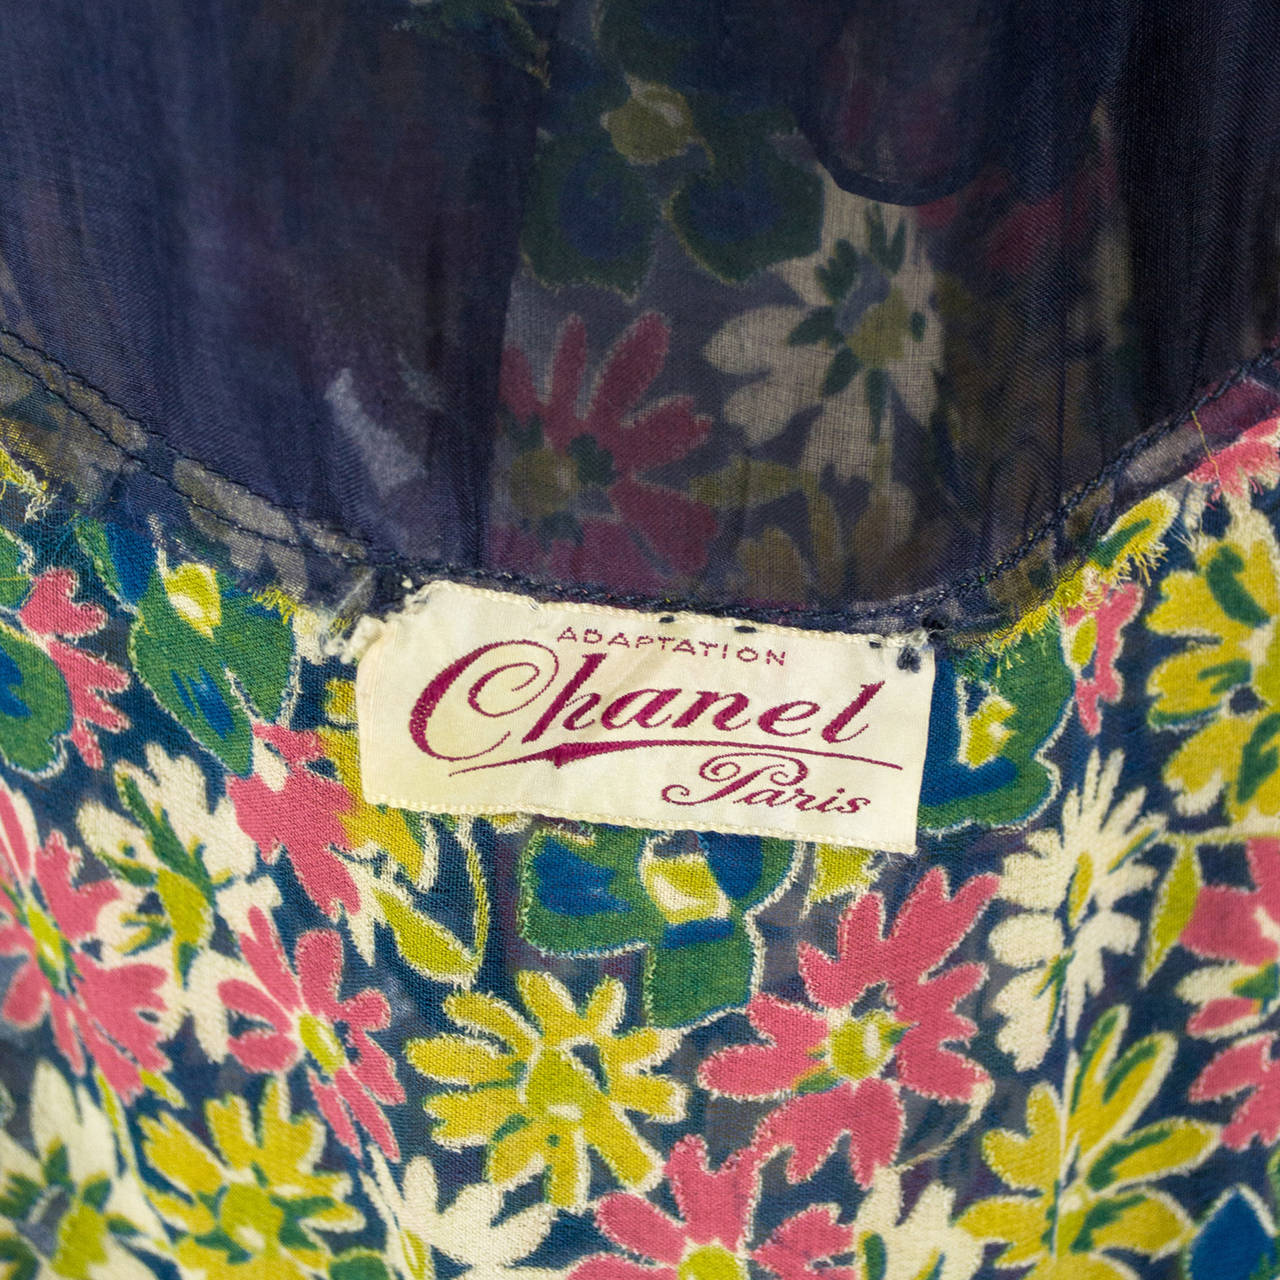 Rare 1930s Vintage Chanel Adaptation Dress Floral Velvet Applique Silk Organza 8